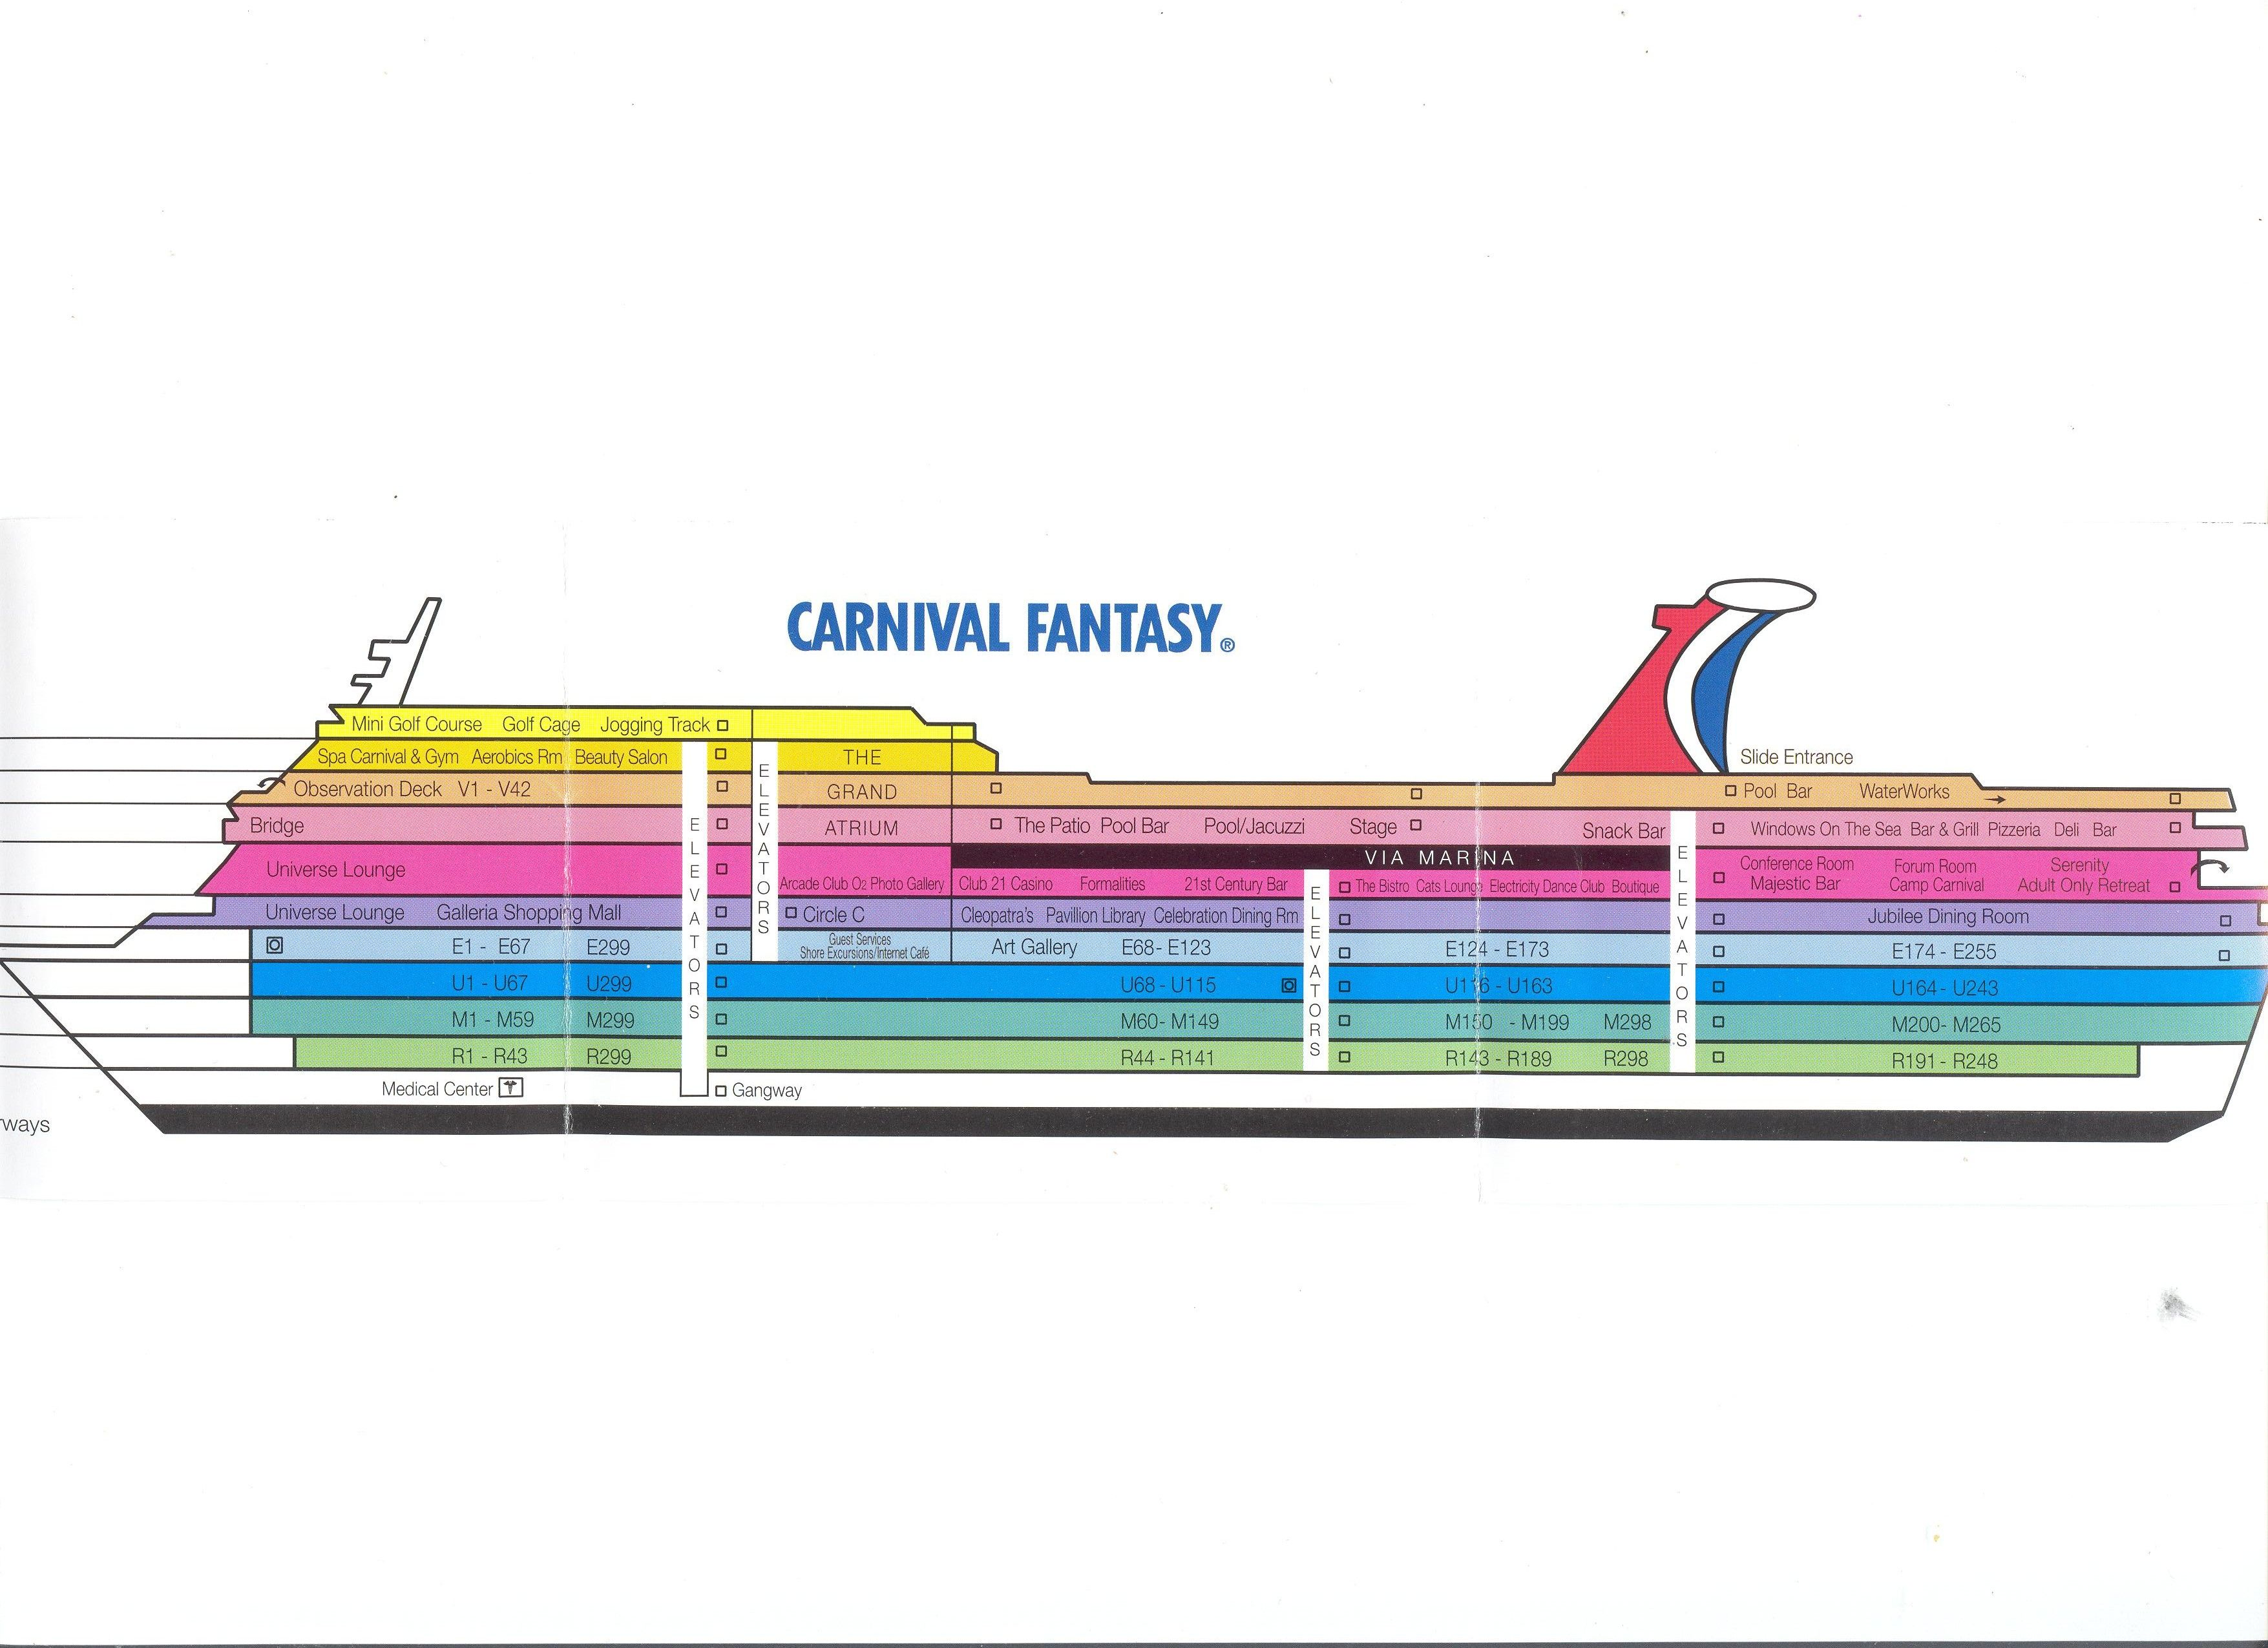 Deck Plan For The Fantasy Carnival Cruising On Funships